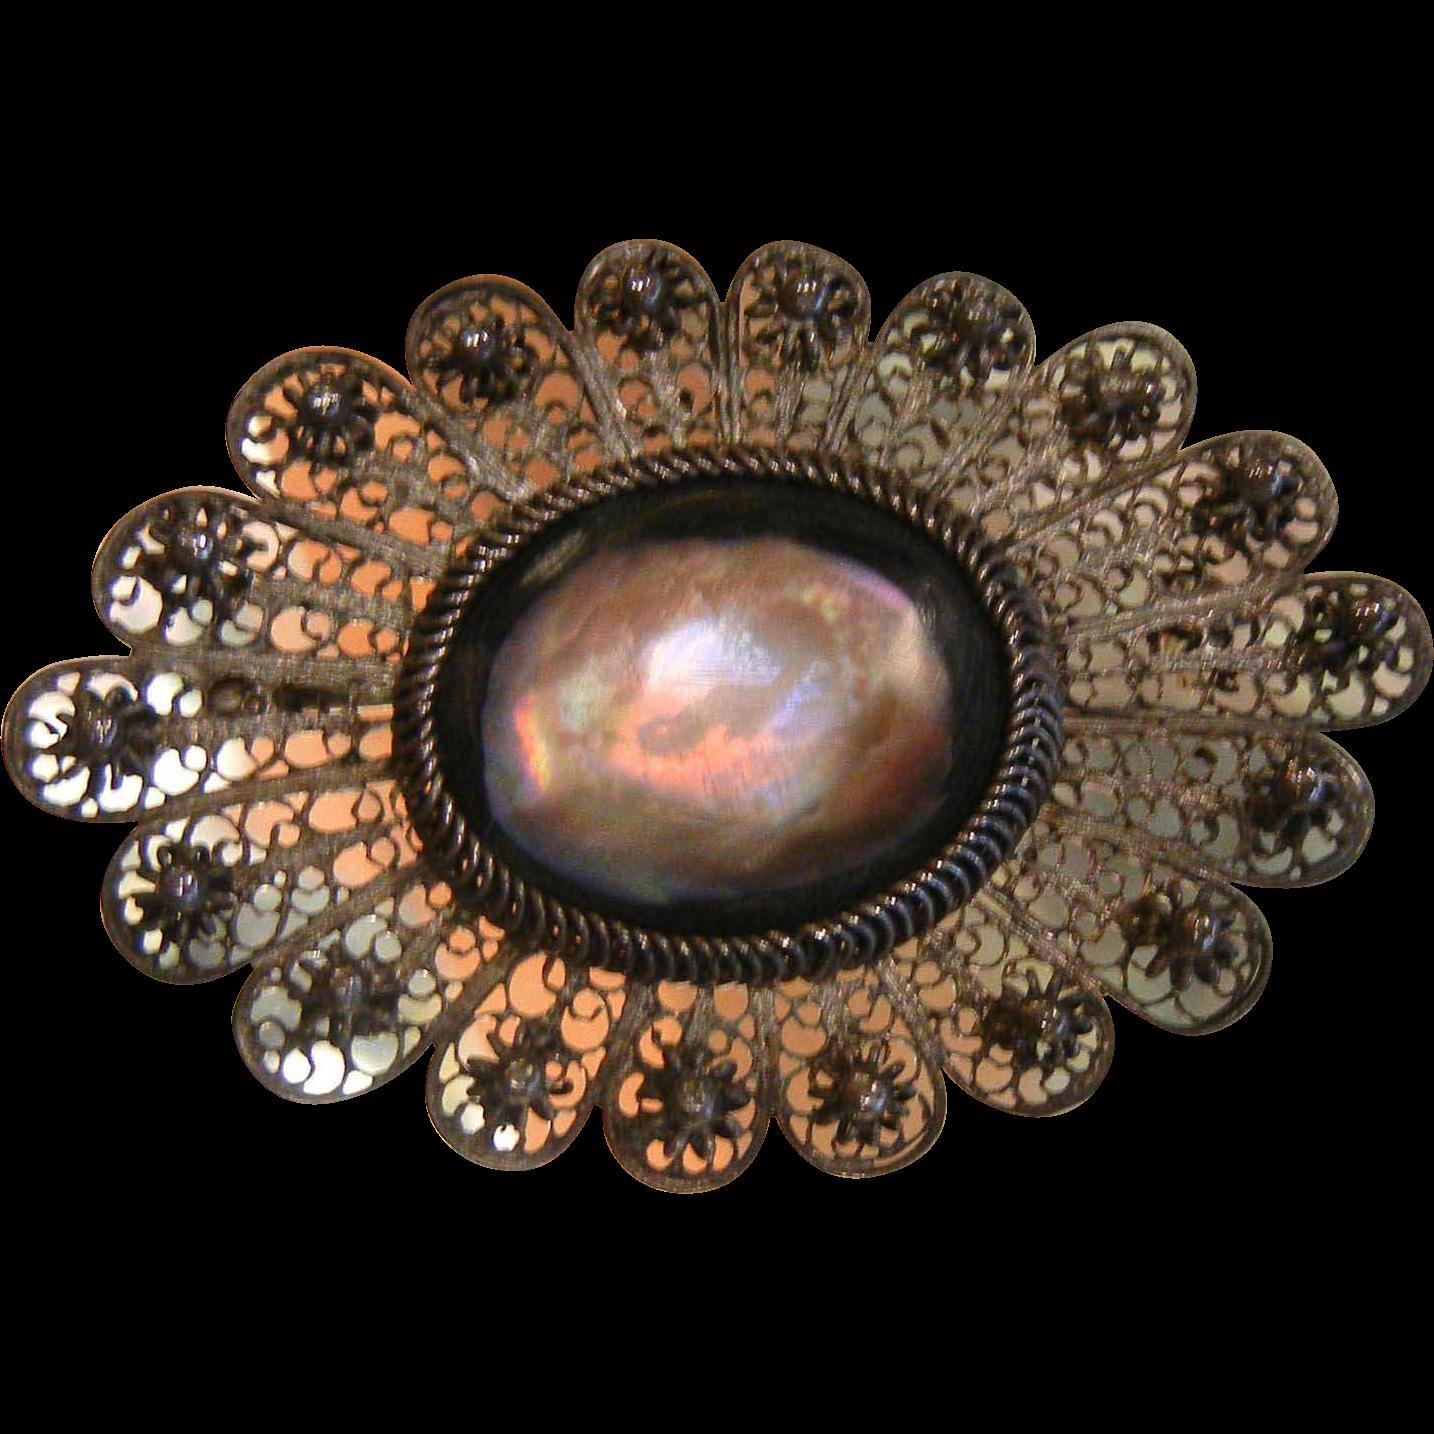 Fine Vintage Silver Filigree Brooch w/ Polished Abalone